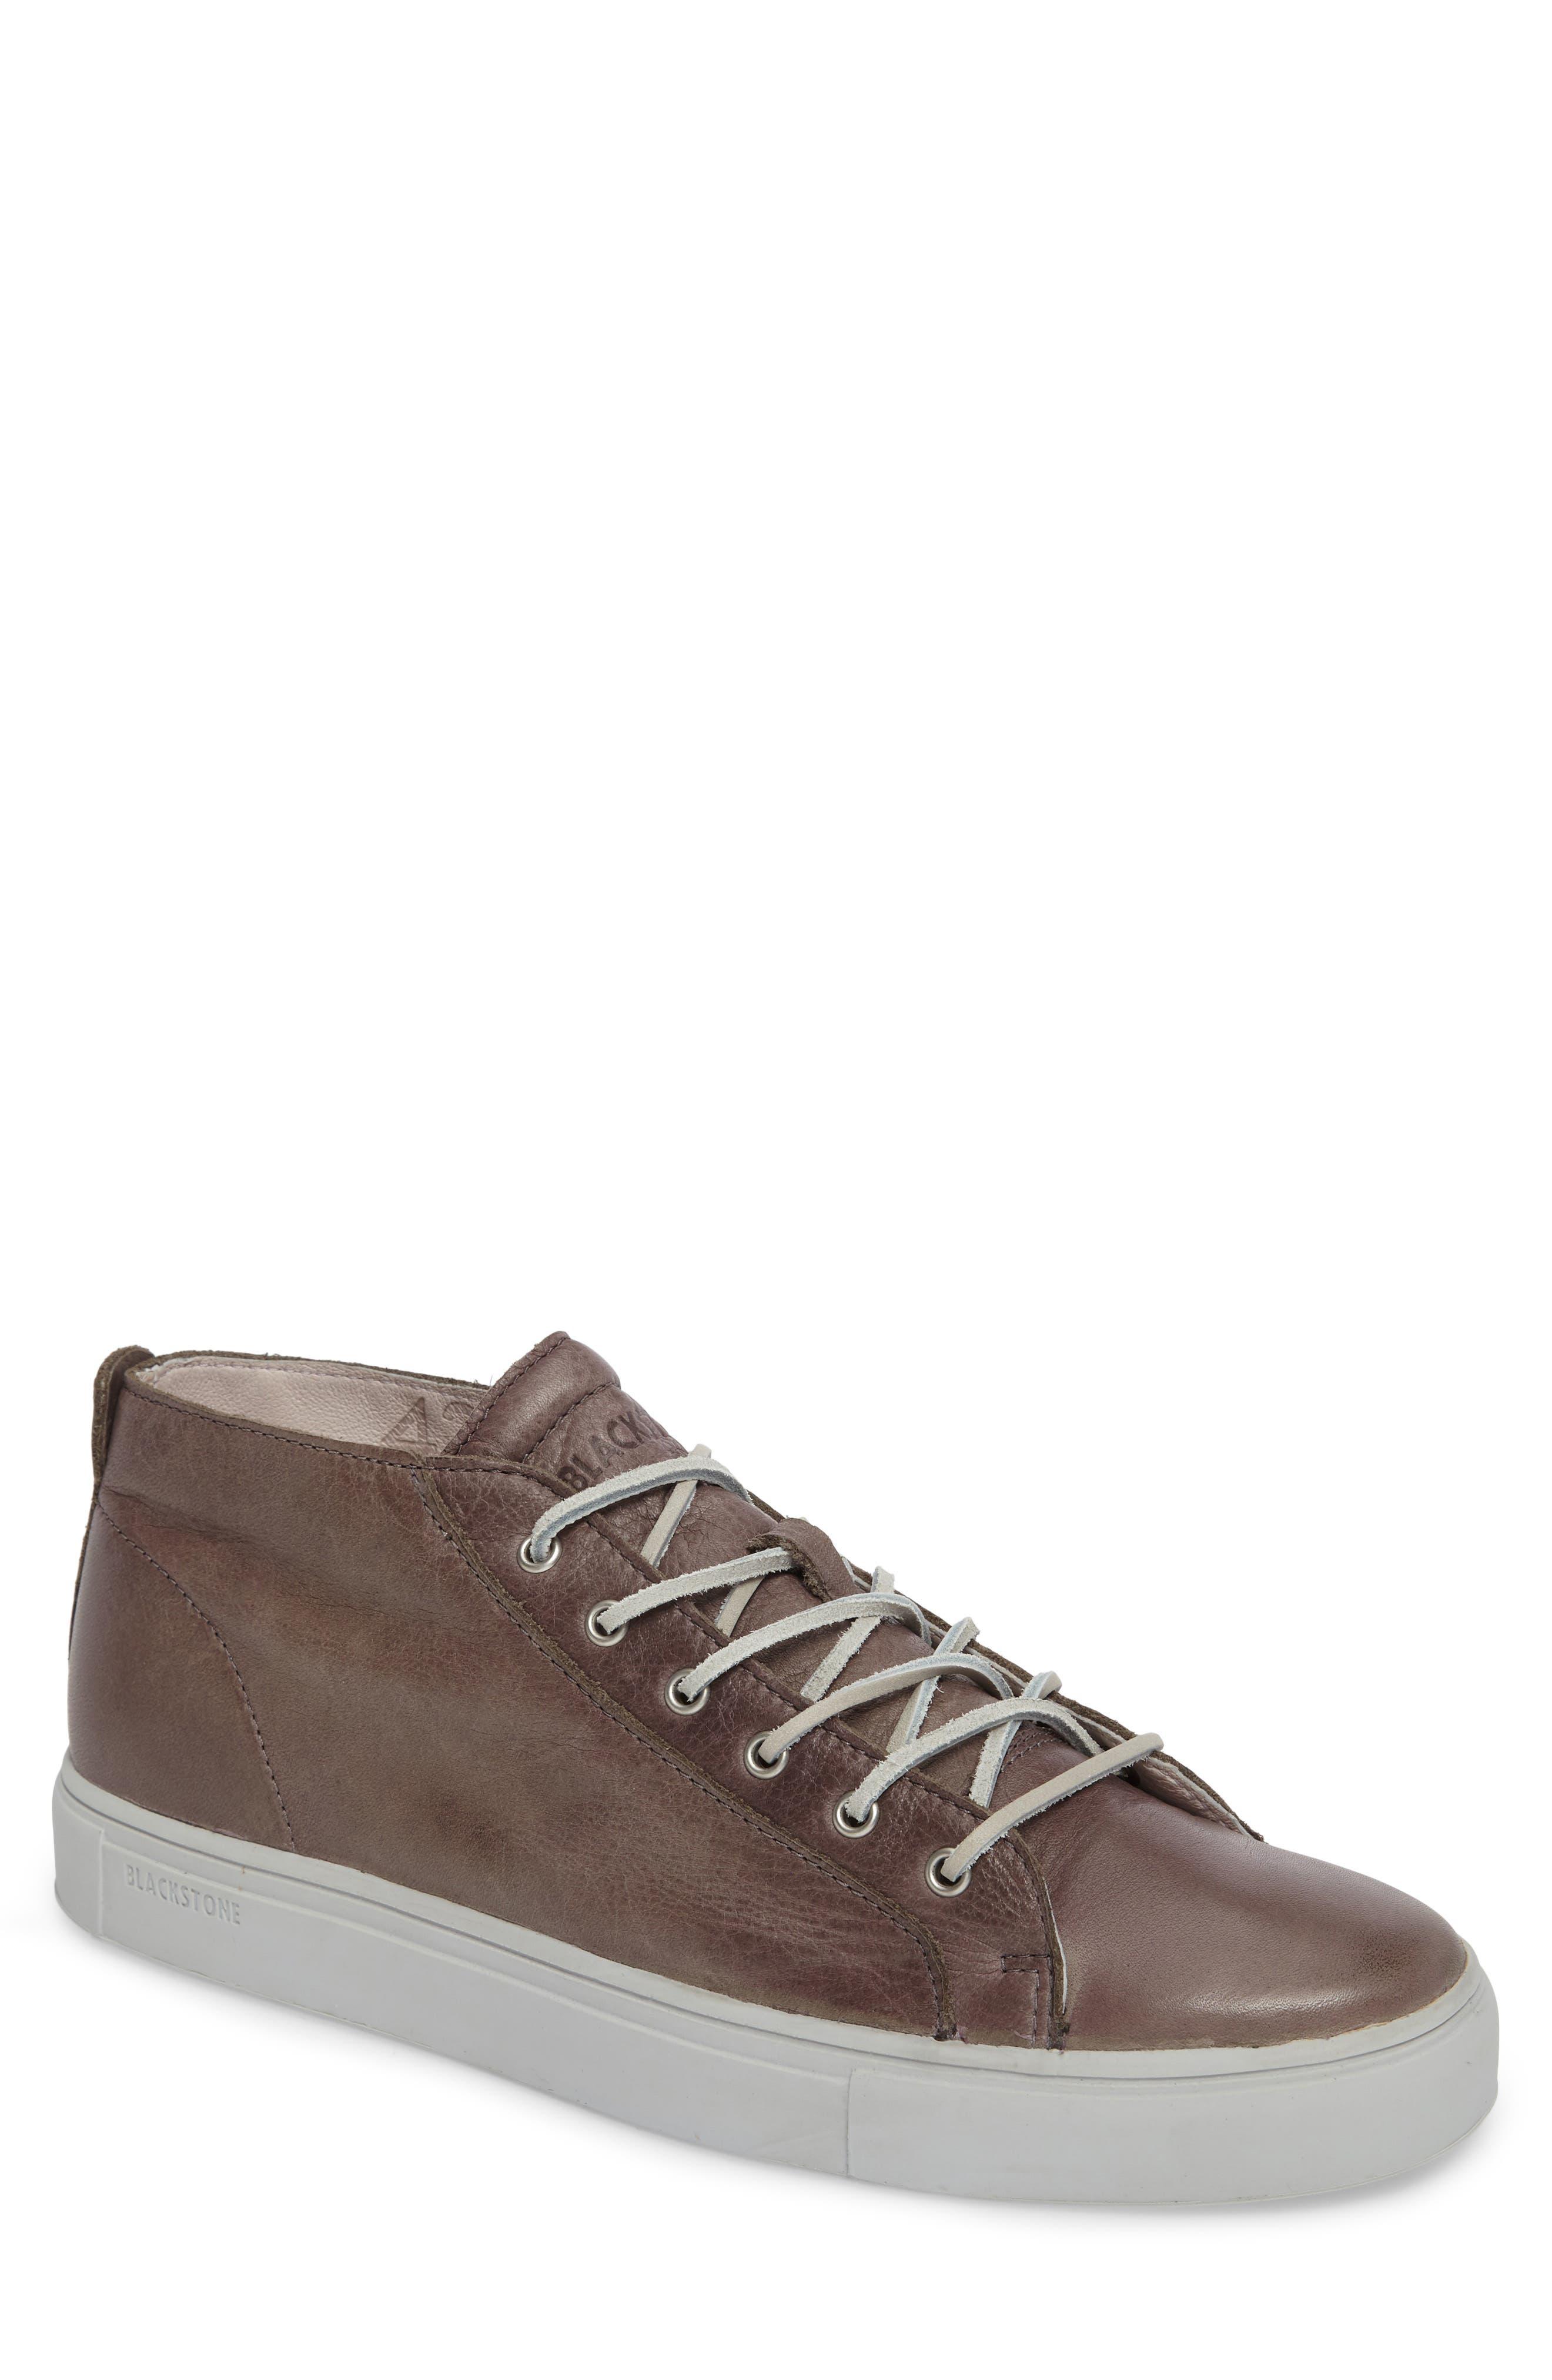 'LM11' Sneaker,                             Main thumbnail 1, color,                             020